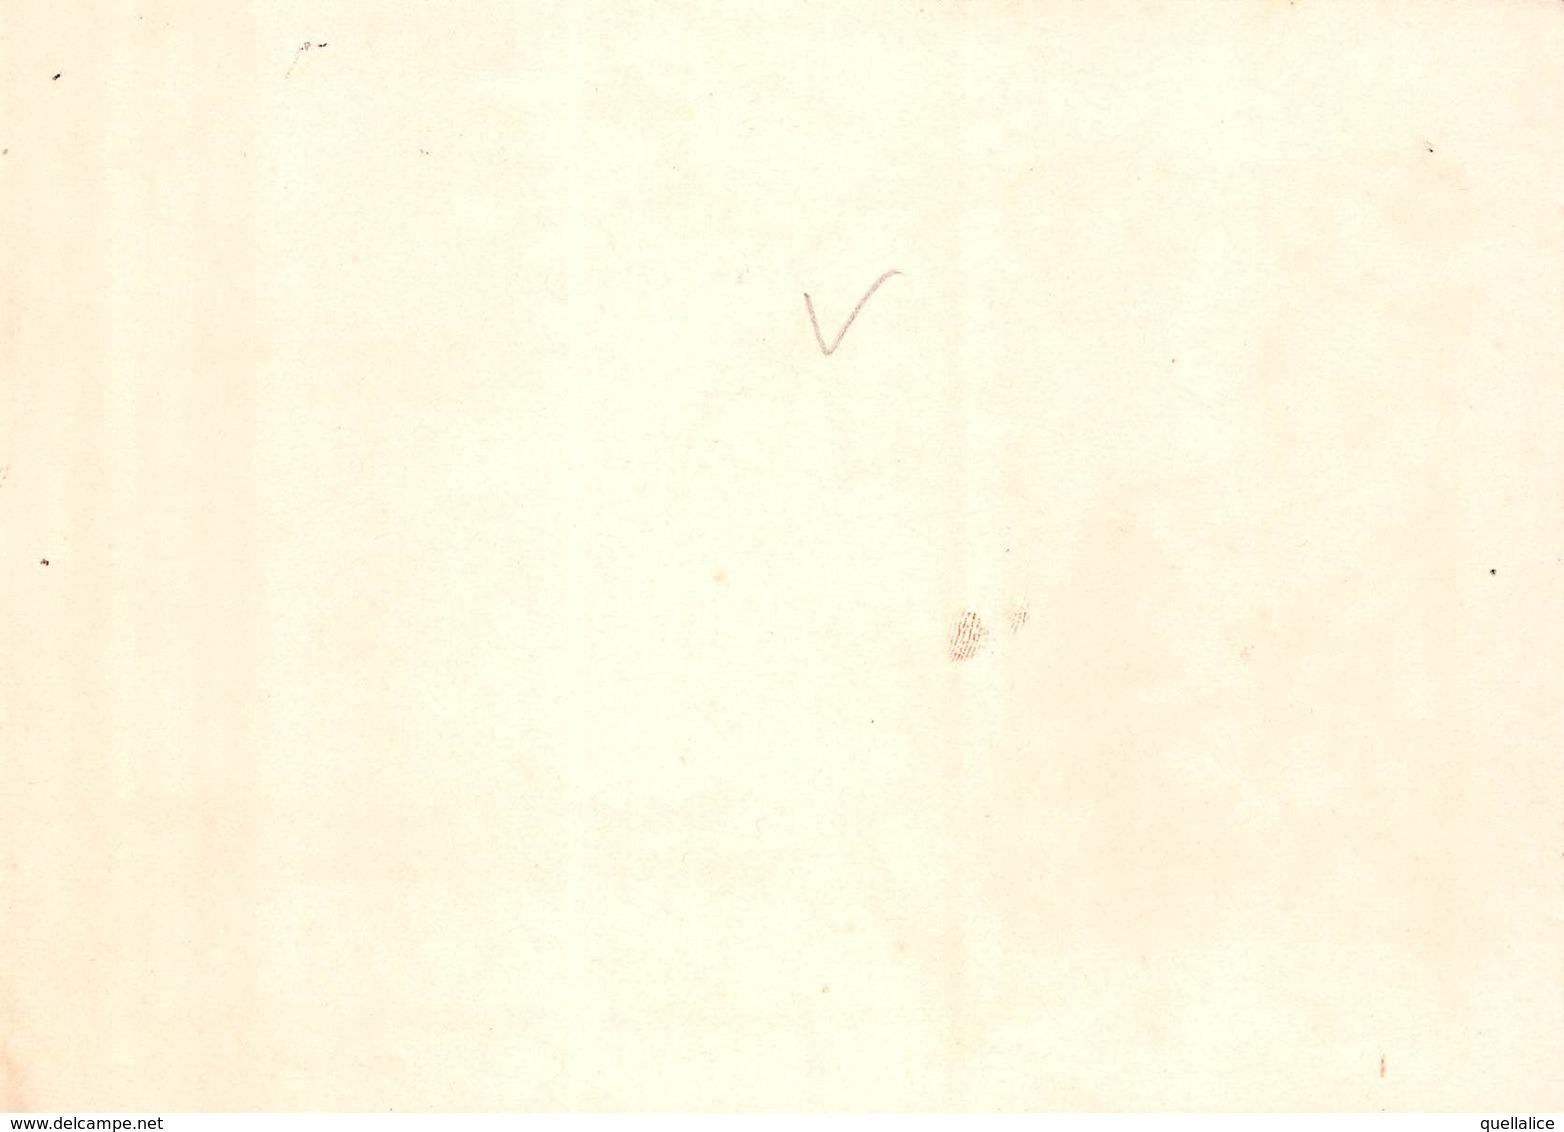 "0358 ""TORINO - GIUSEPPE PIA - MACELLERIE DI 1° CLASSE - CASA ESPORTATRICE DI CARNI FRESCHE"" PUBBL. ORIG. LIBERTY - Autres"